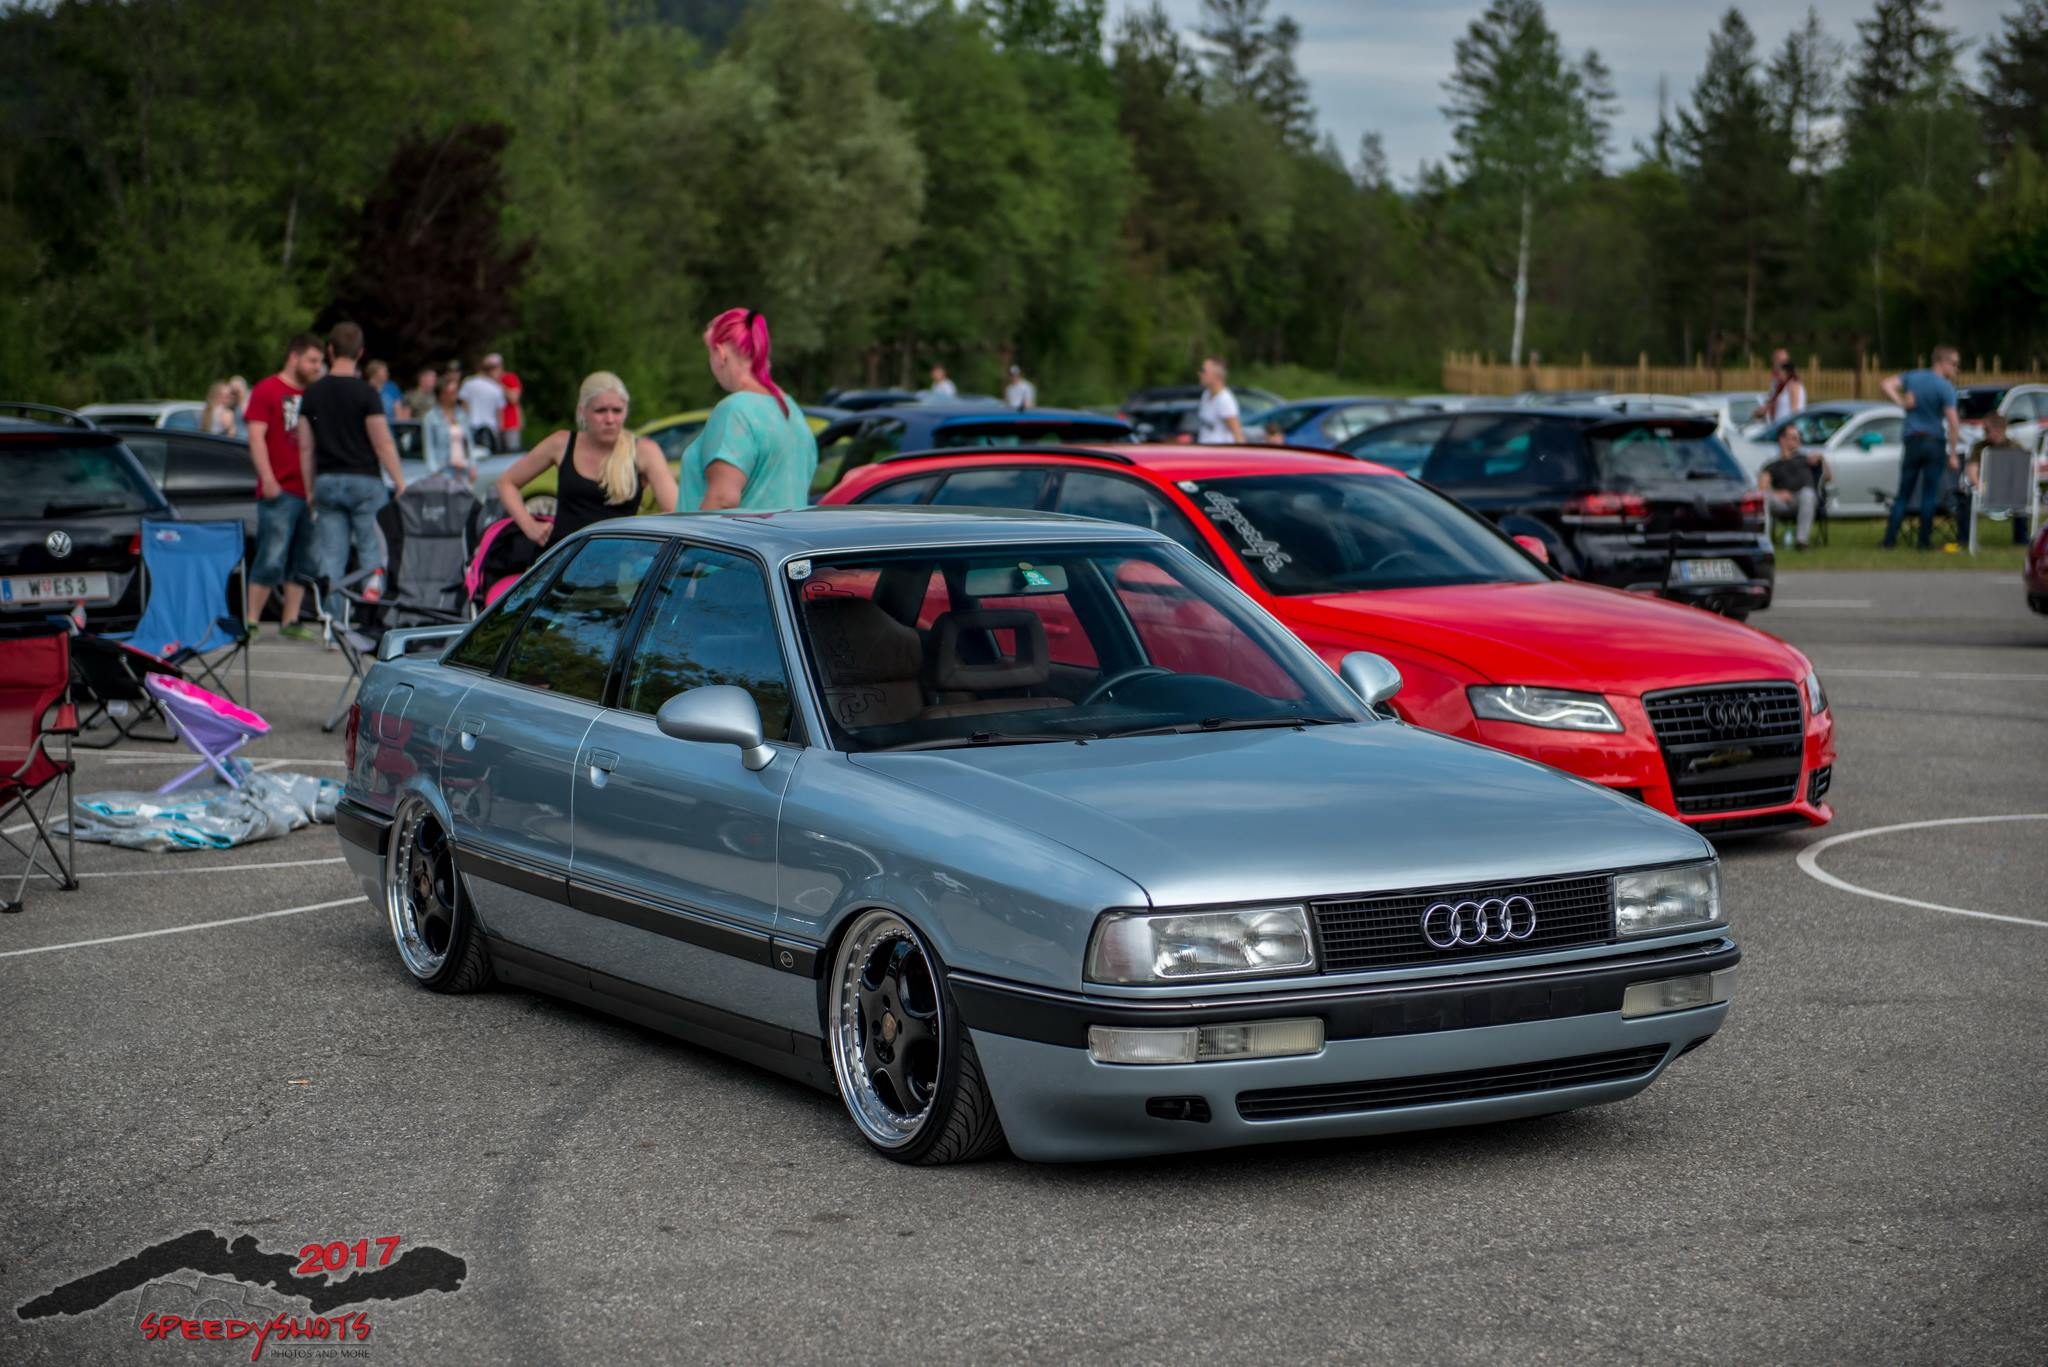 General 2048x1367 Audi tuning car car meets Audi 80/90 B3 Audi A6